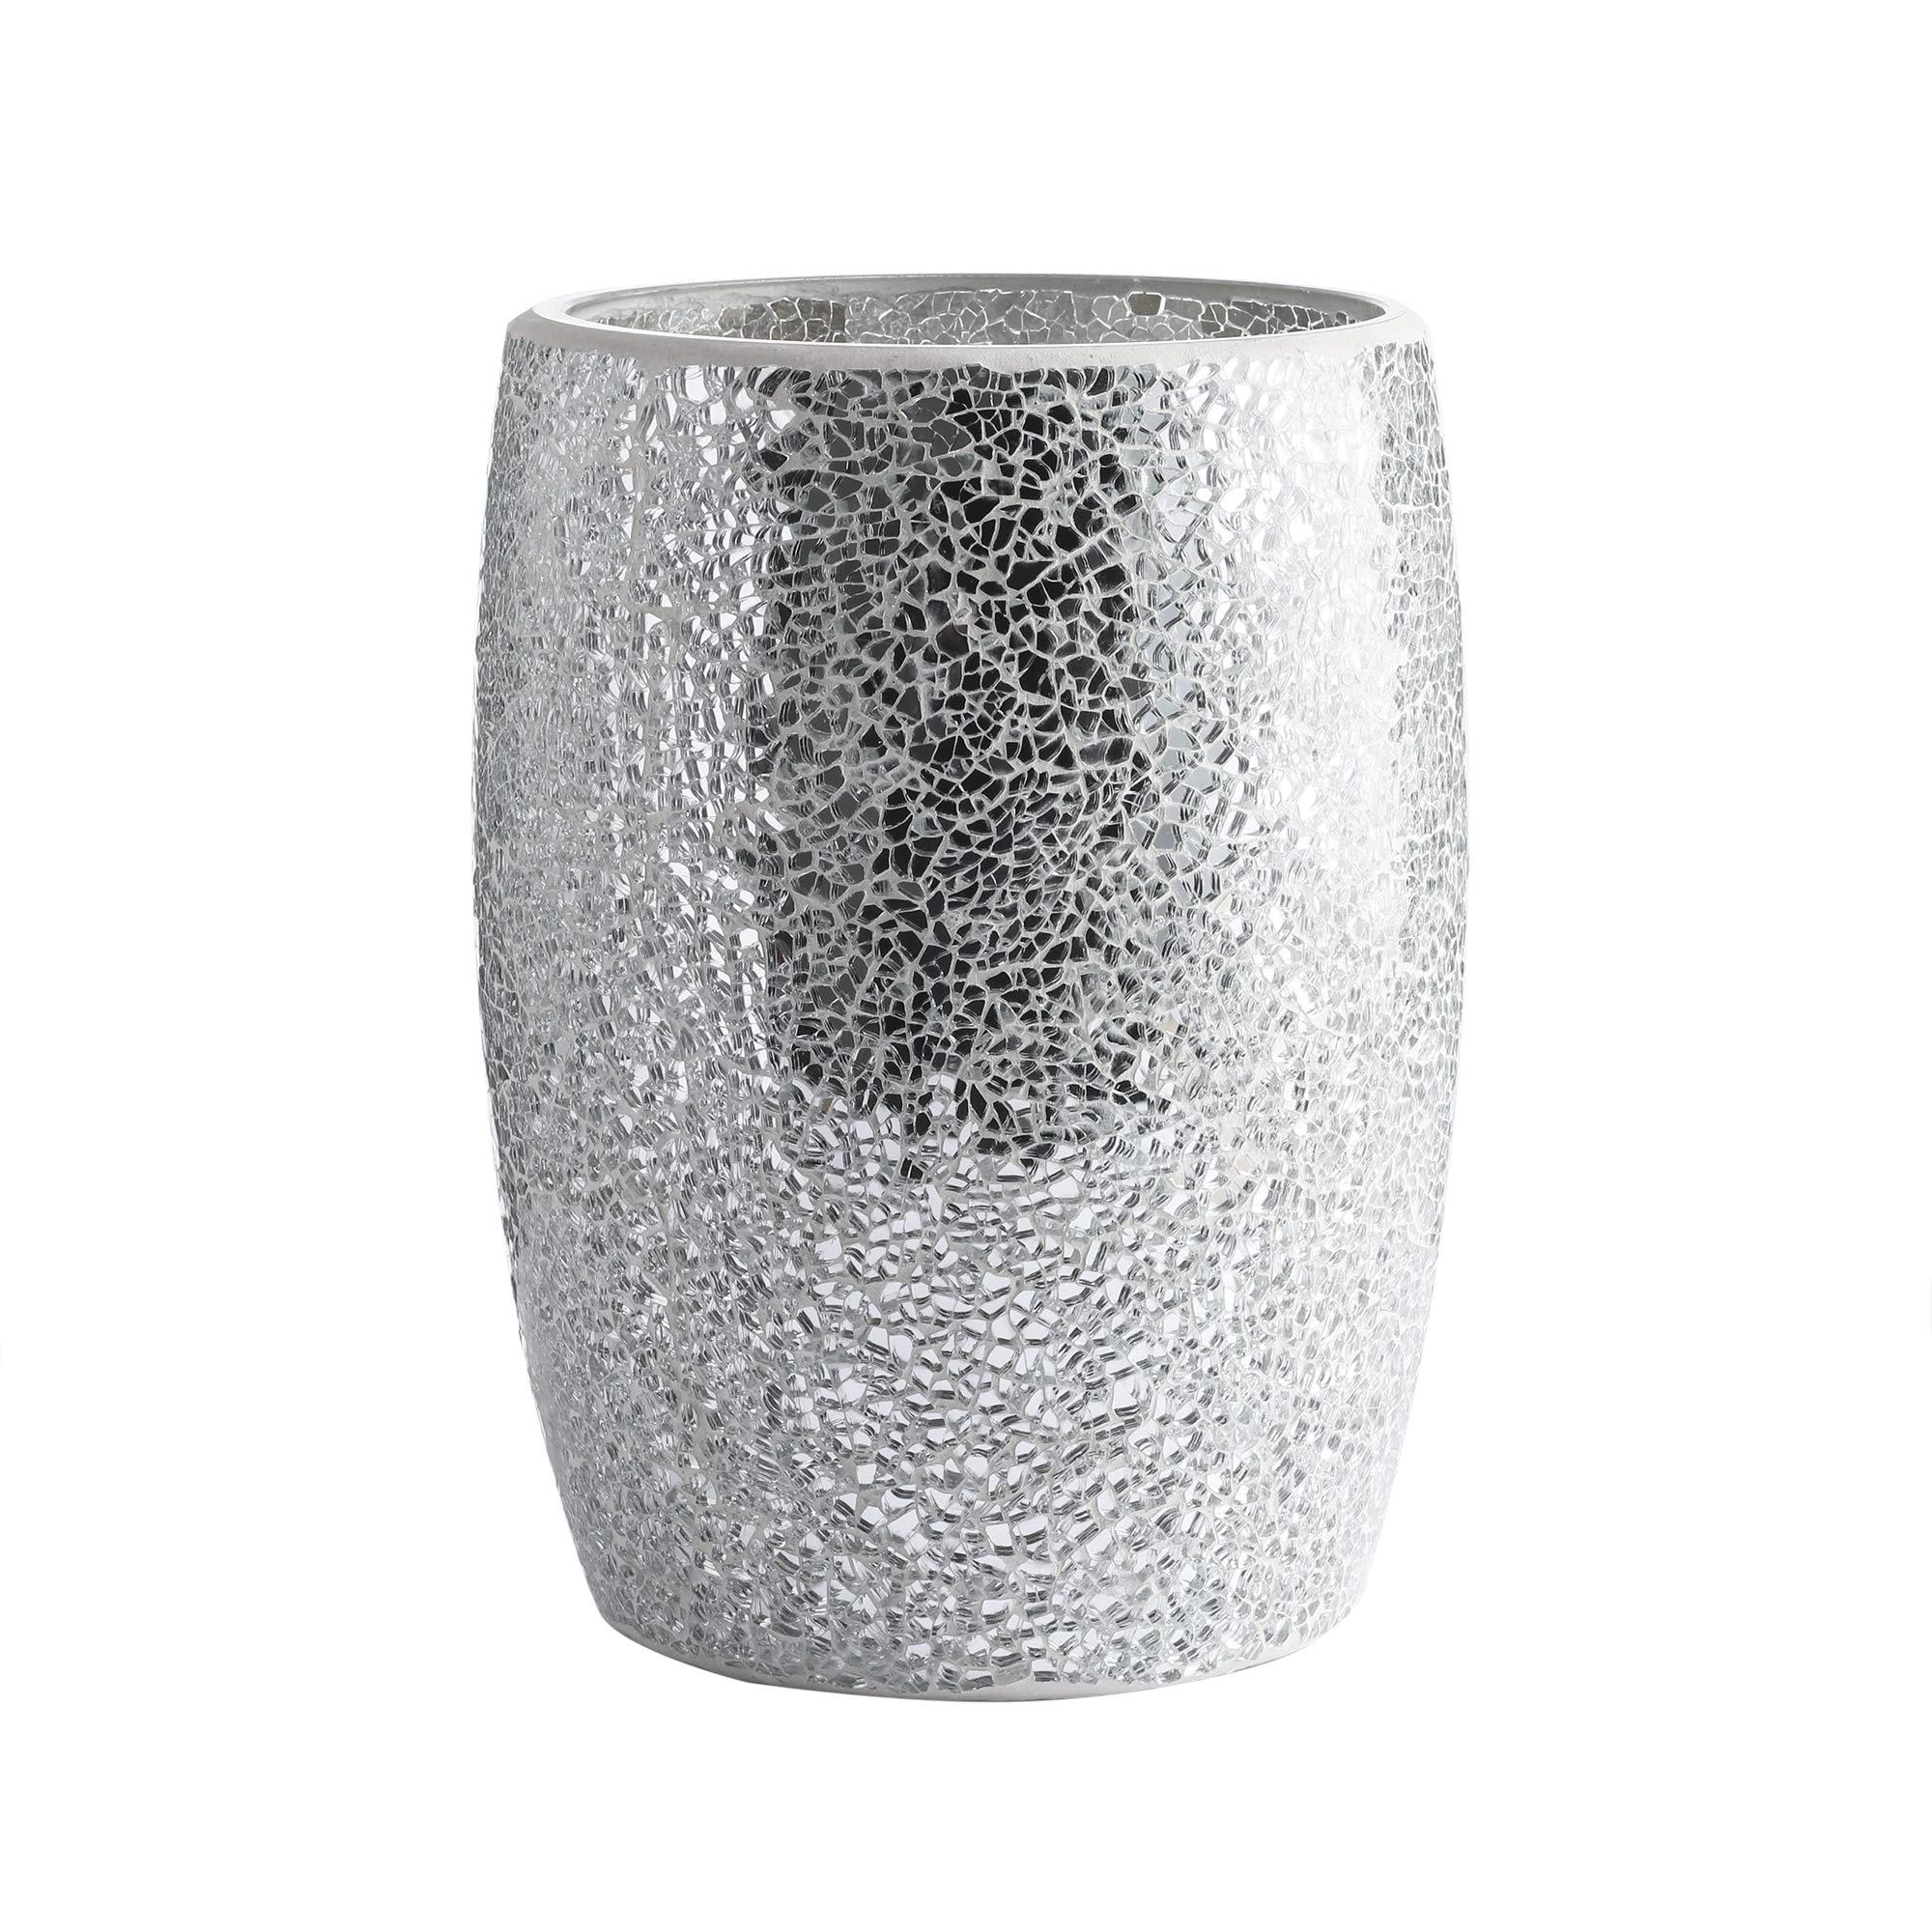 Whole Housewares Bathroom Wastebasket - Glass Mosaic Decorative Trash Can Dia 7.5'' H 10'' (Silver) by Whole Housewares